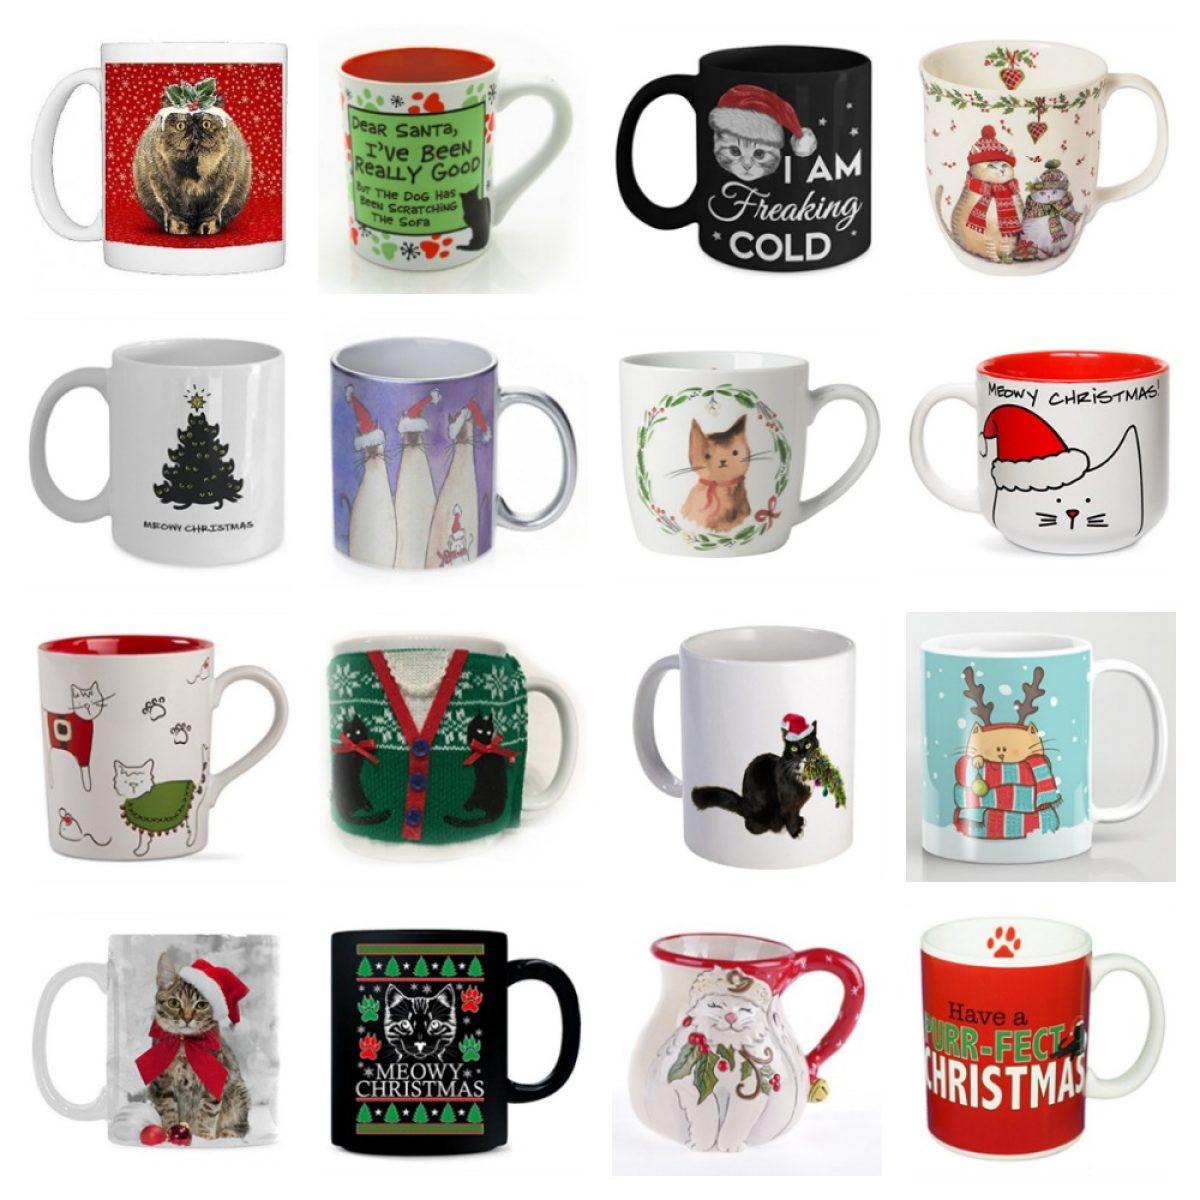 Funny Mugs Lets Eat Kitty Punctuation Saves Cats Christmas MAGIC NOVELTY MUG